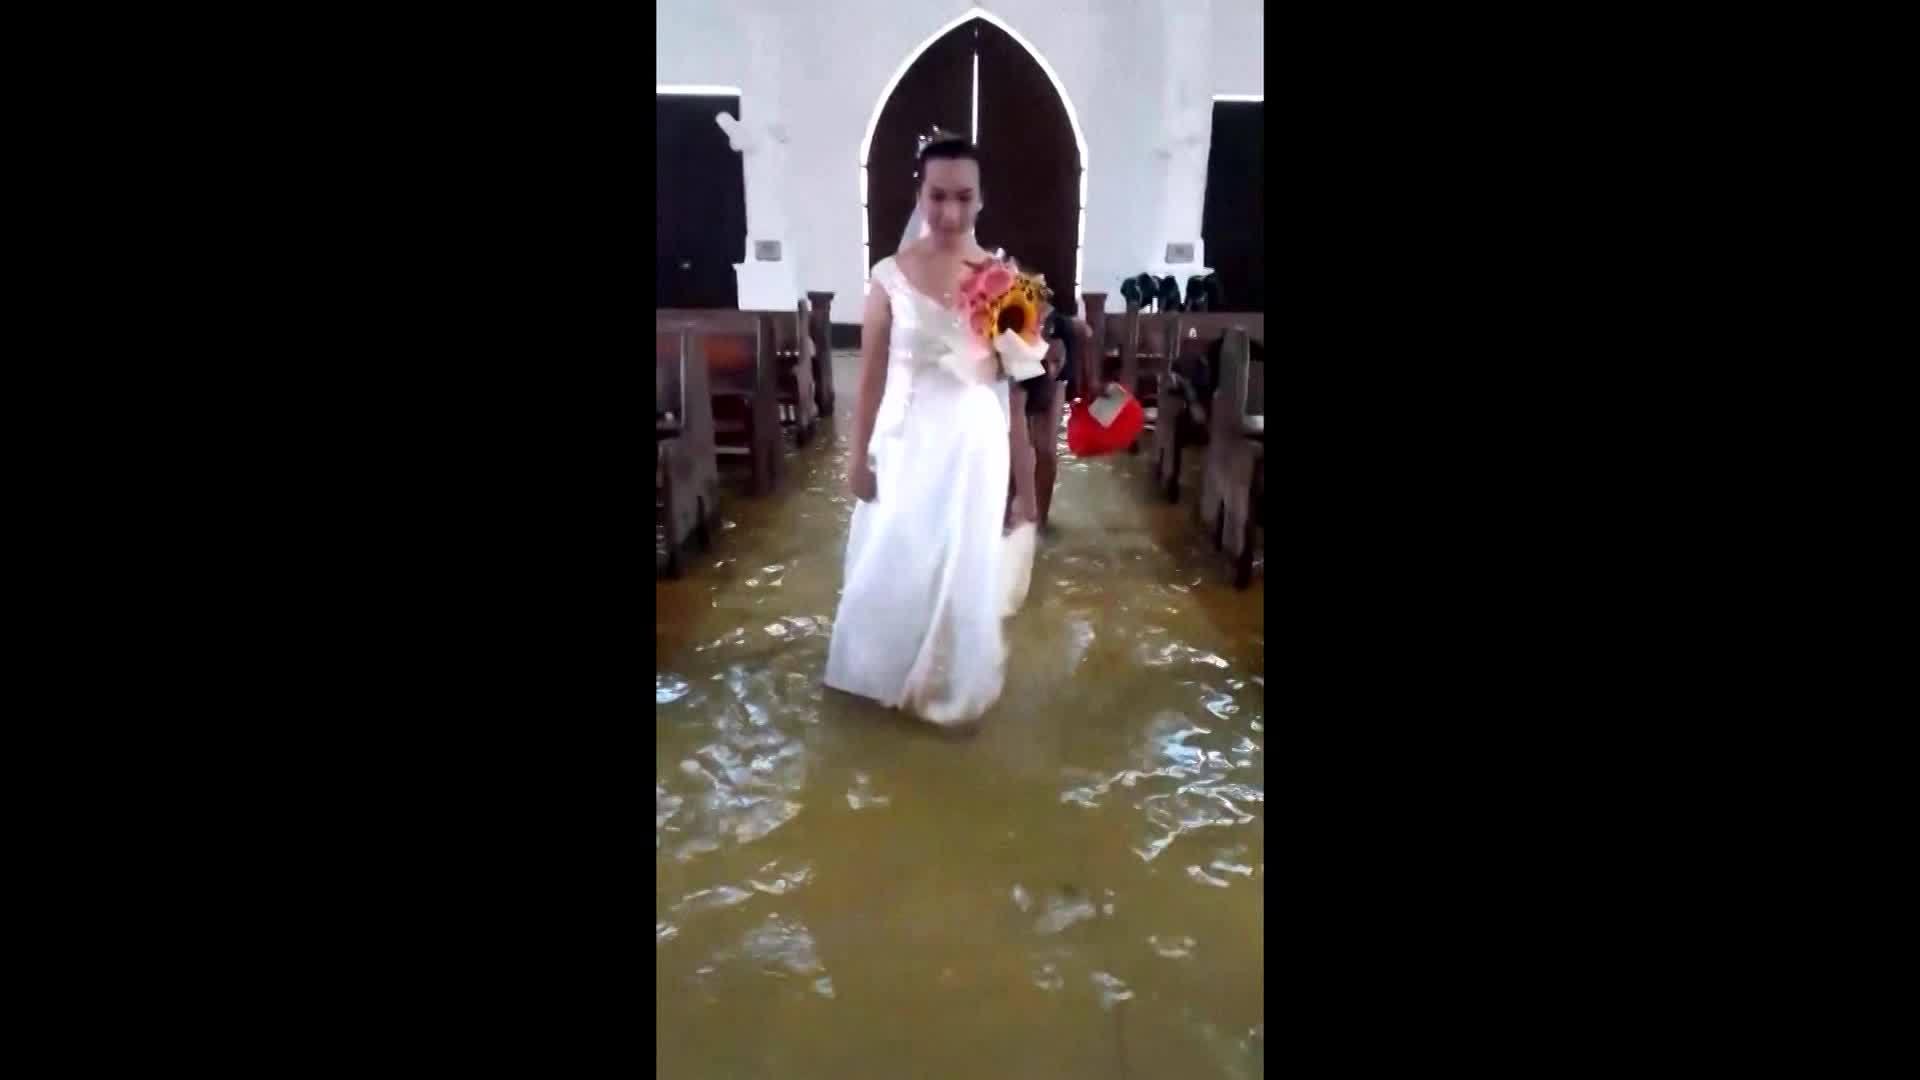 VIDEO: Bride walks down aisle of flooded church